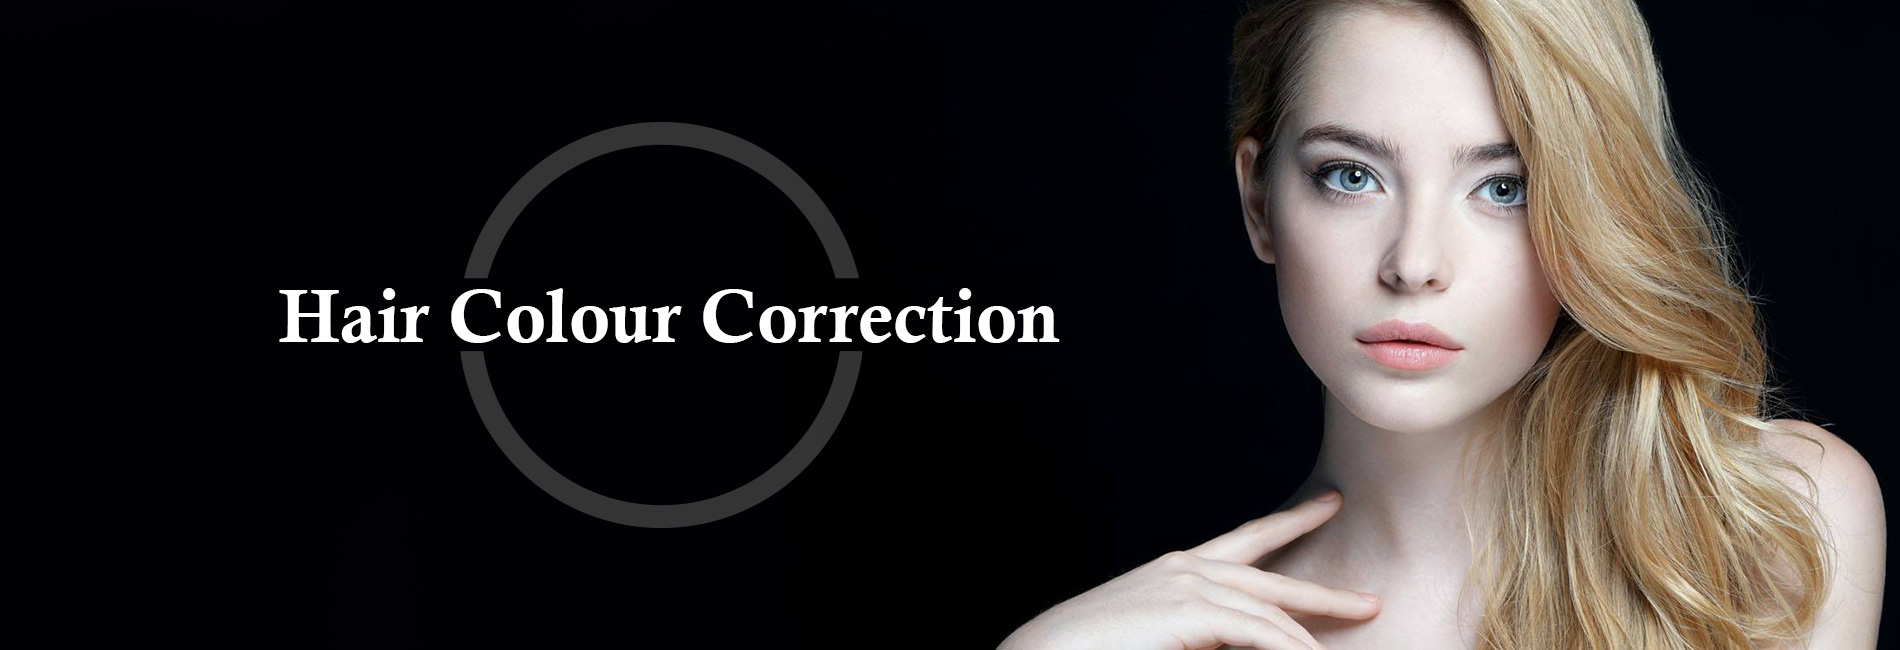 Hair Colour Correction 2